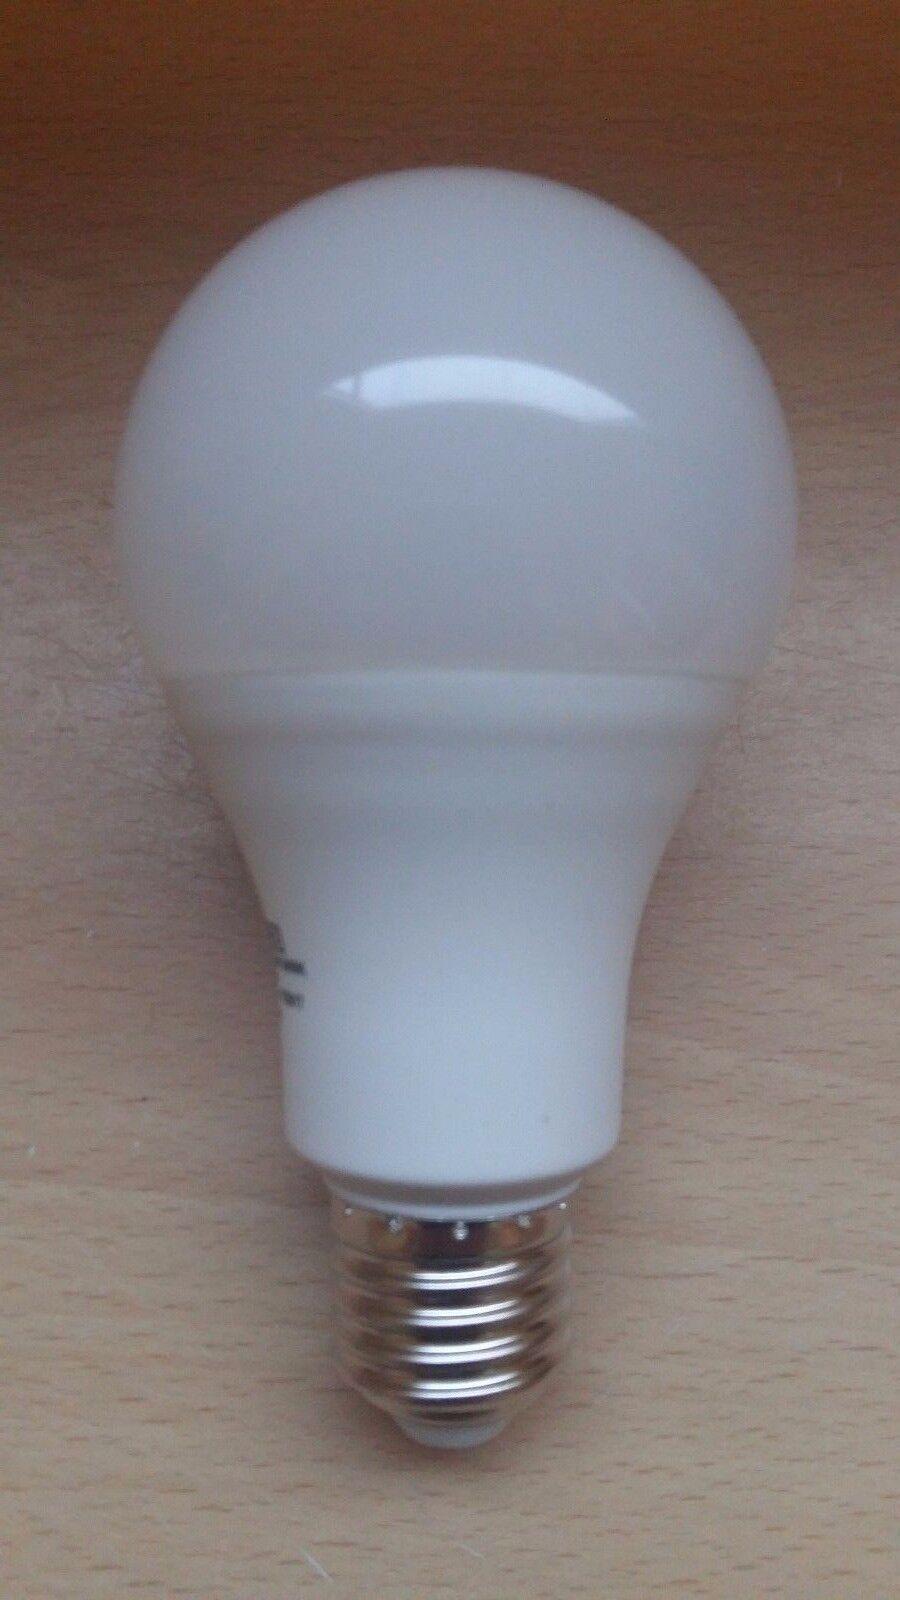 10 x  15w LED GLS Light Bulb Lamp ES Screw In E27 Warm White 100w Great Value